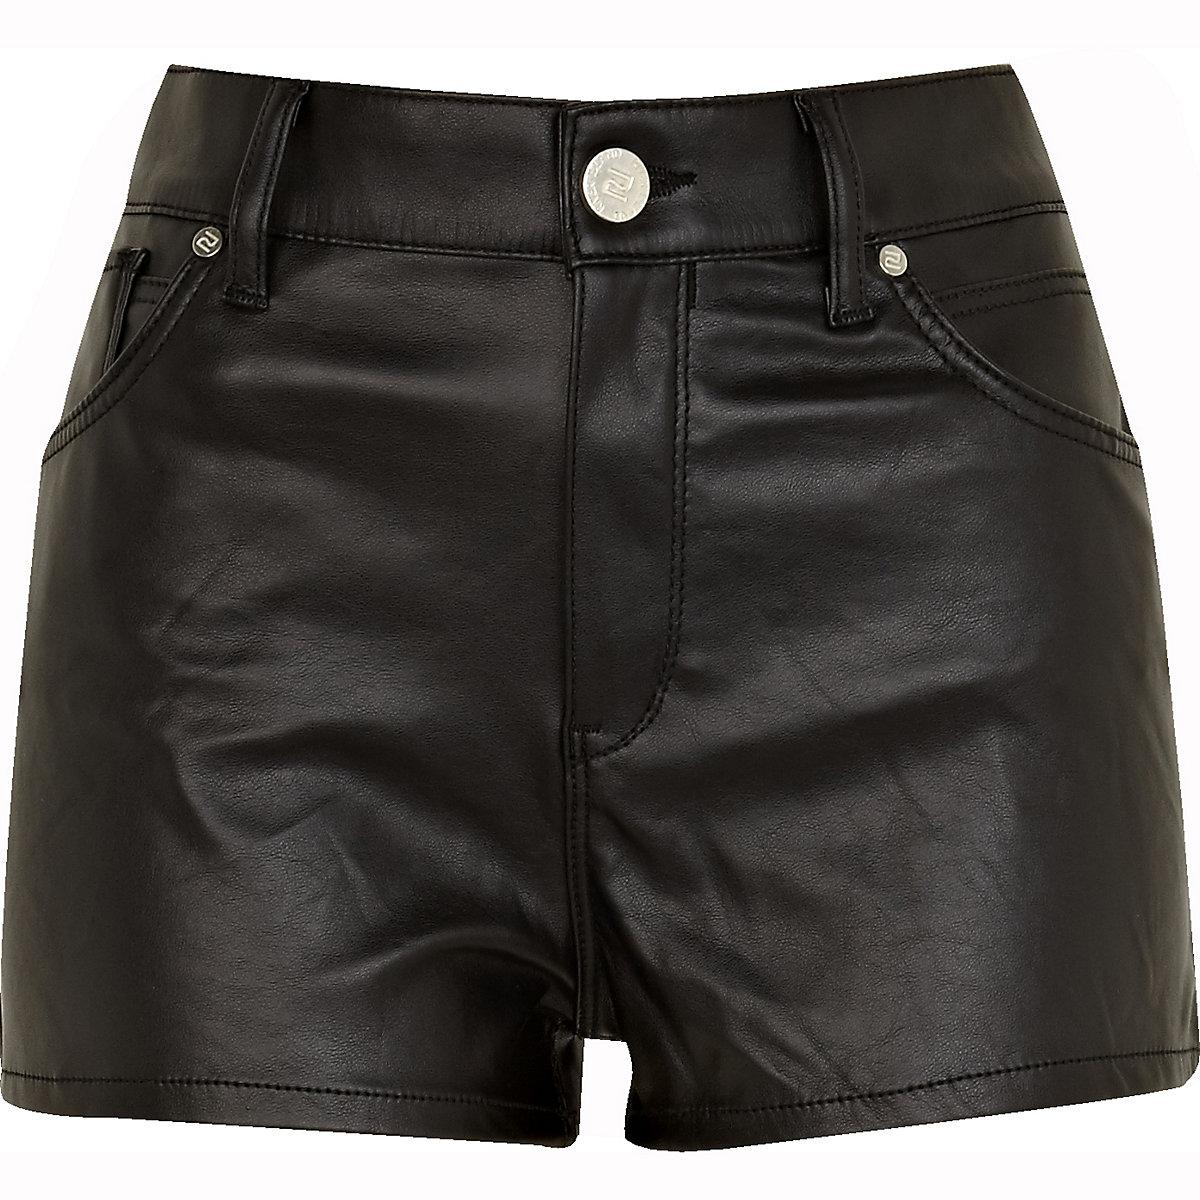 b6cb17c43d2 Black leather look shorts - Denim Shorts - Shorts - women